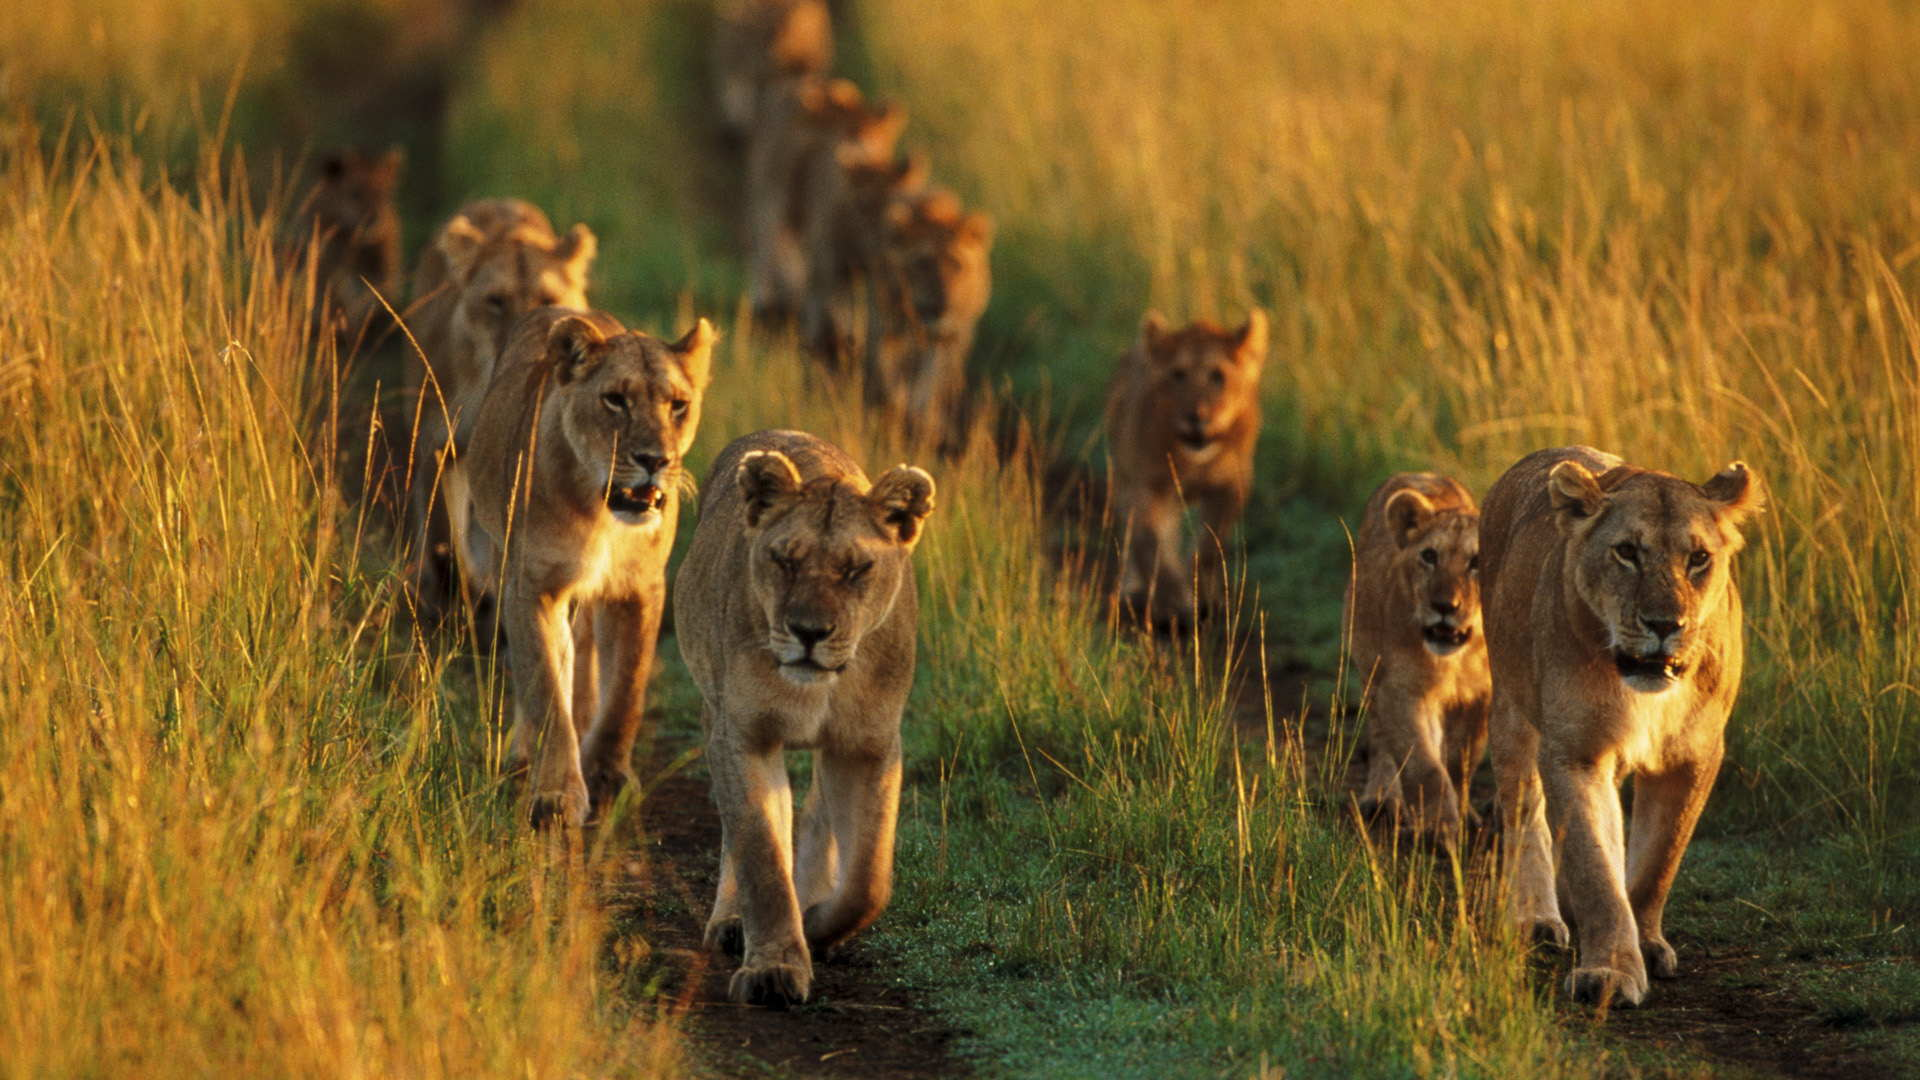 animal-sunset-photo-gallery-lion-pride